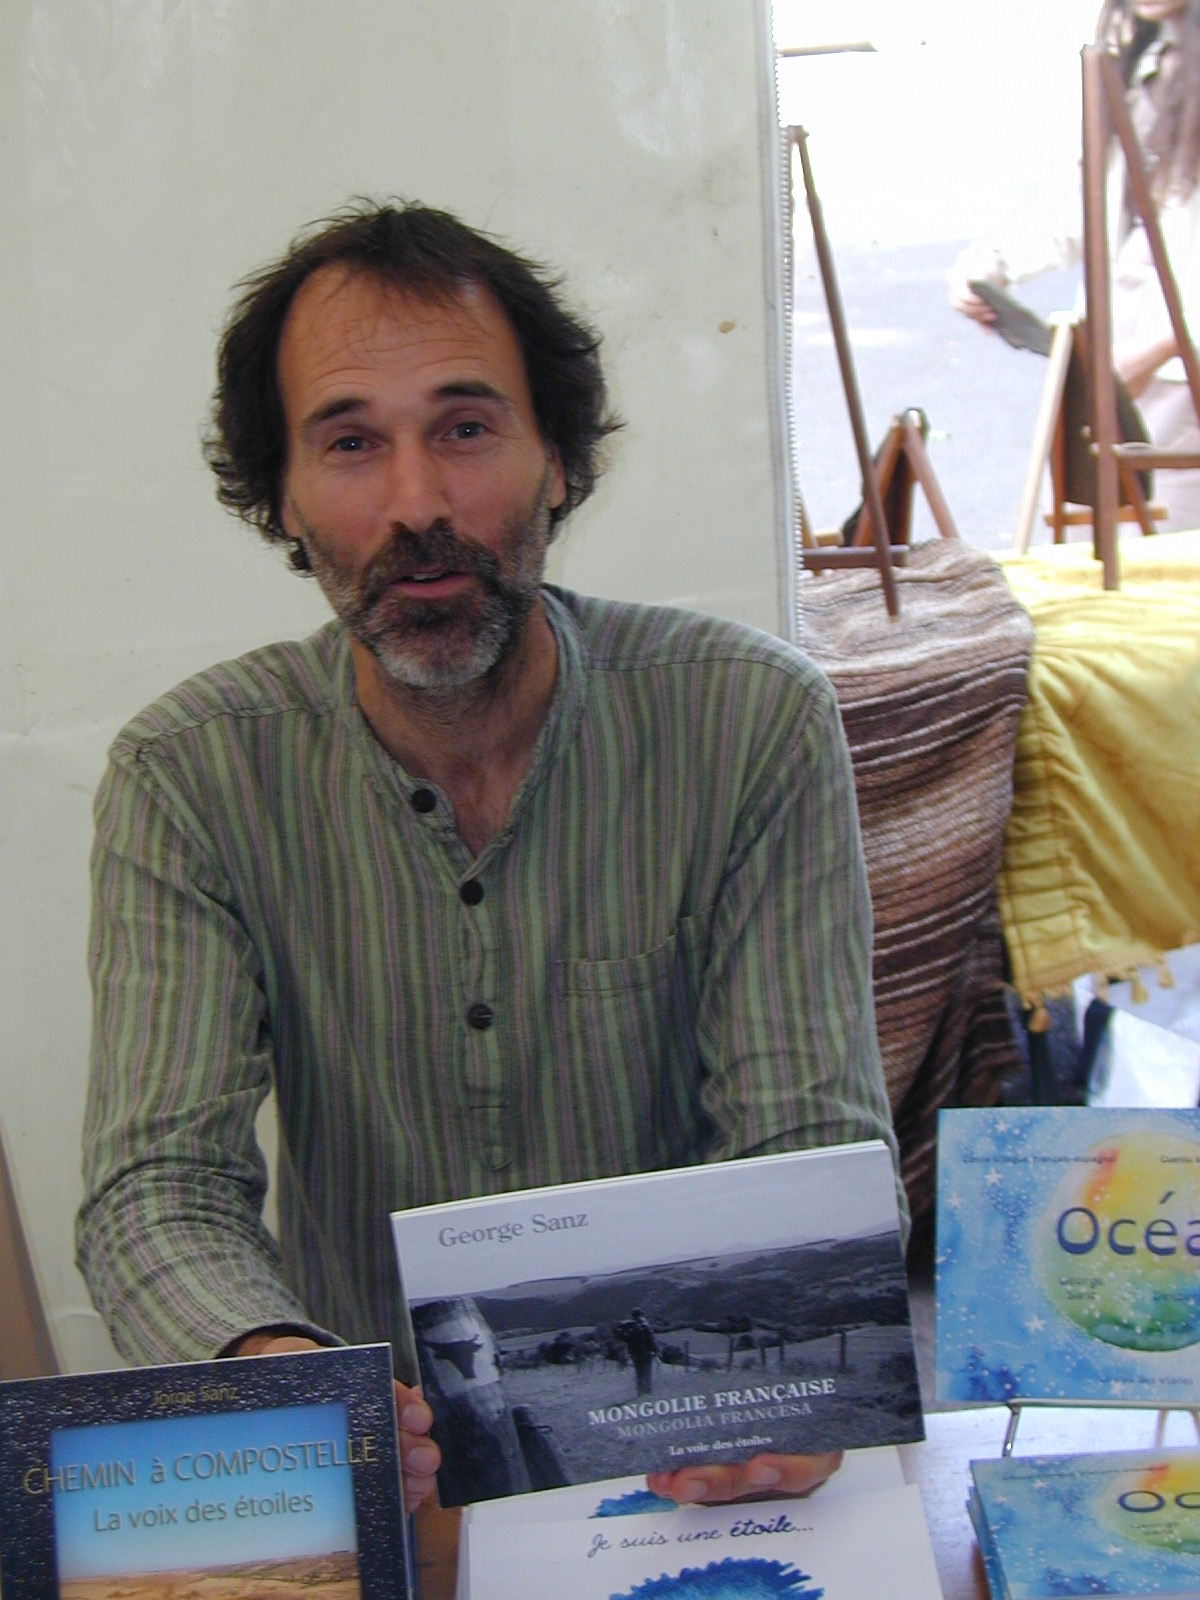 George Sanz